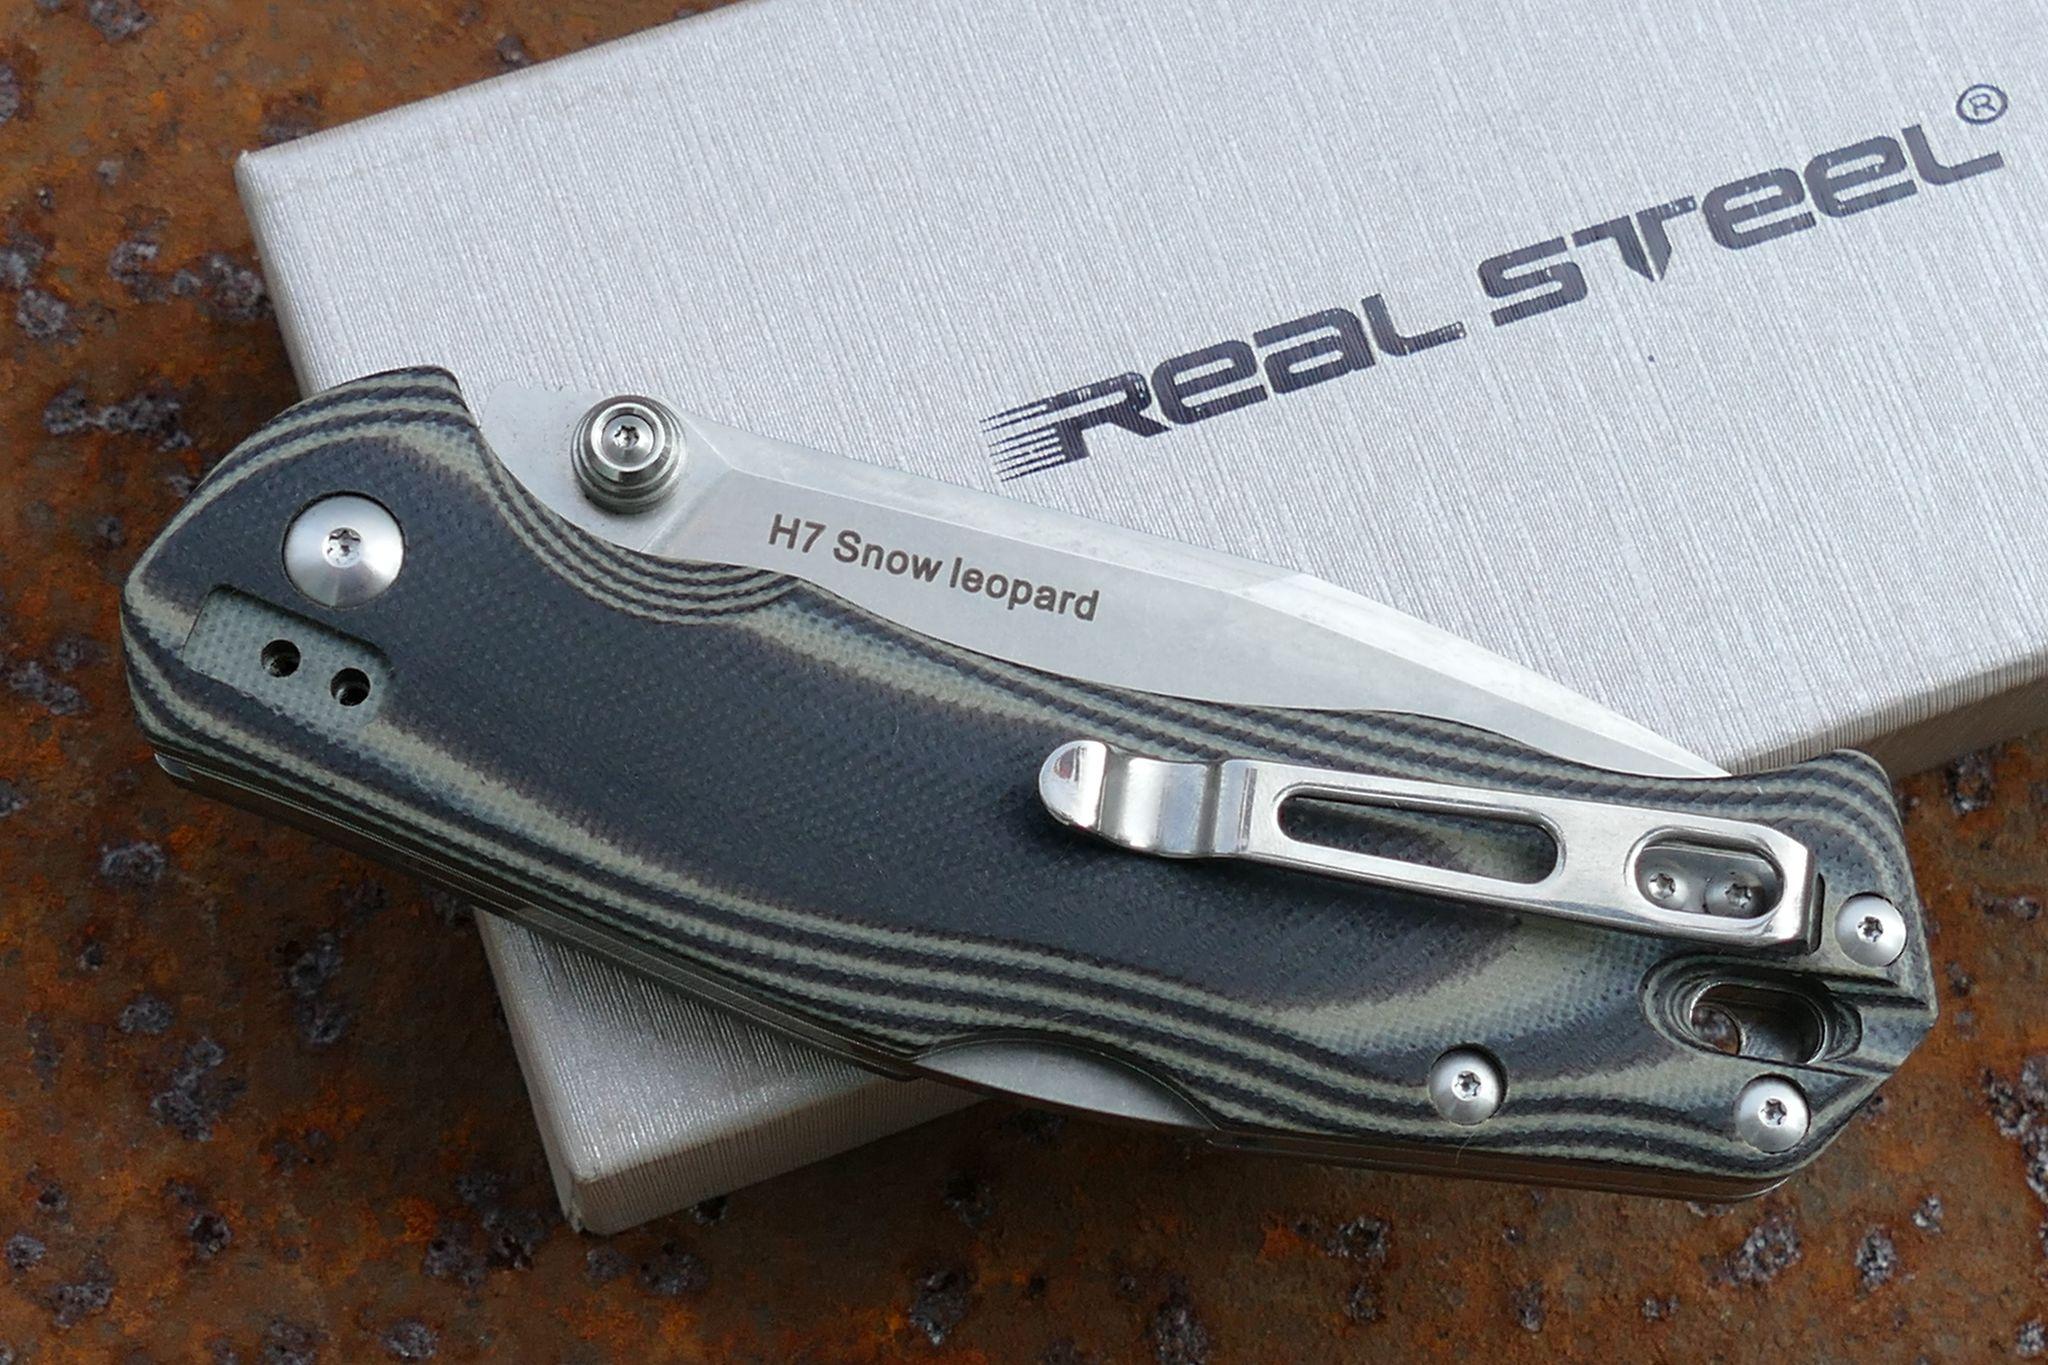 Фото 4 - Нож складной H7 Snow Leopard, Black/Gray G10 от Realsteel